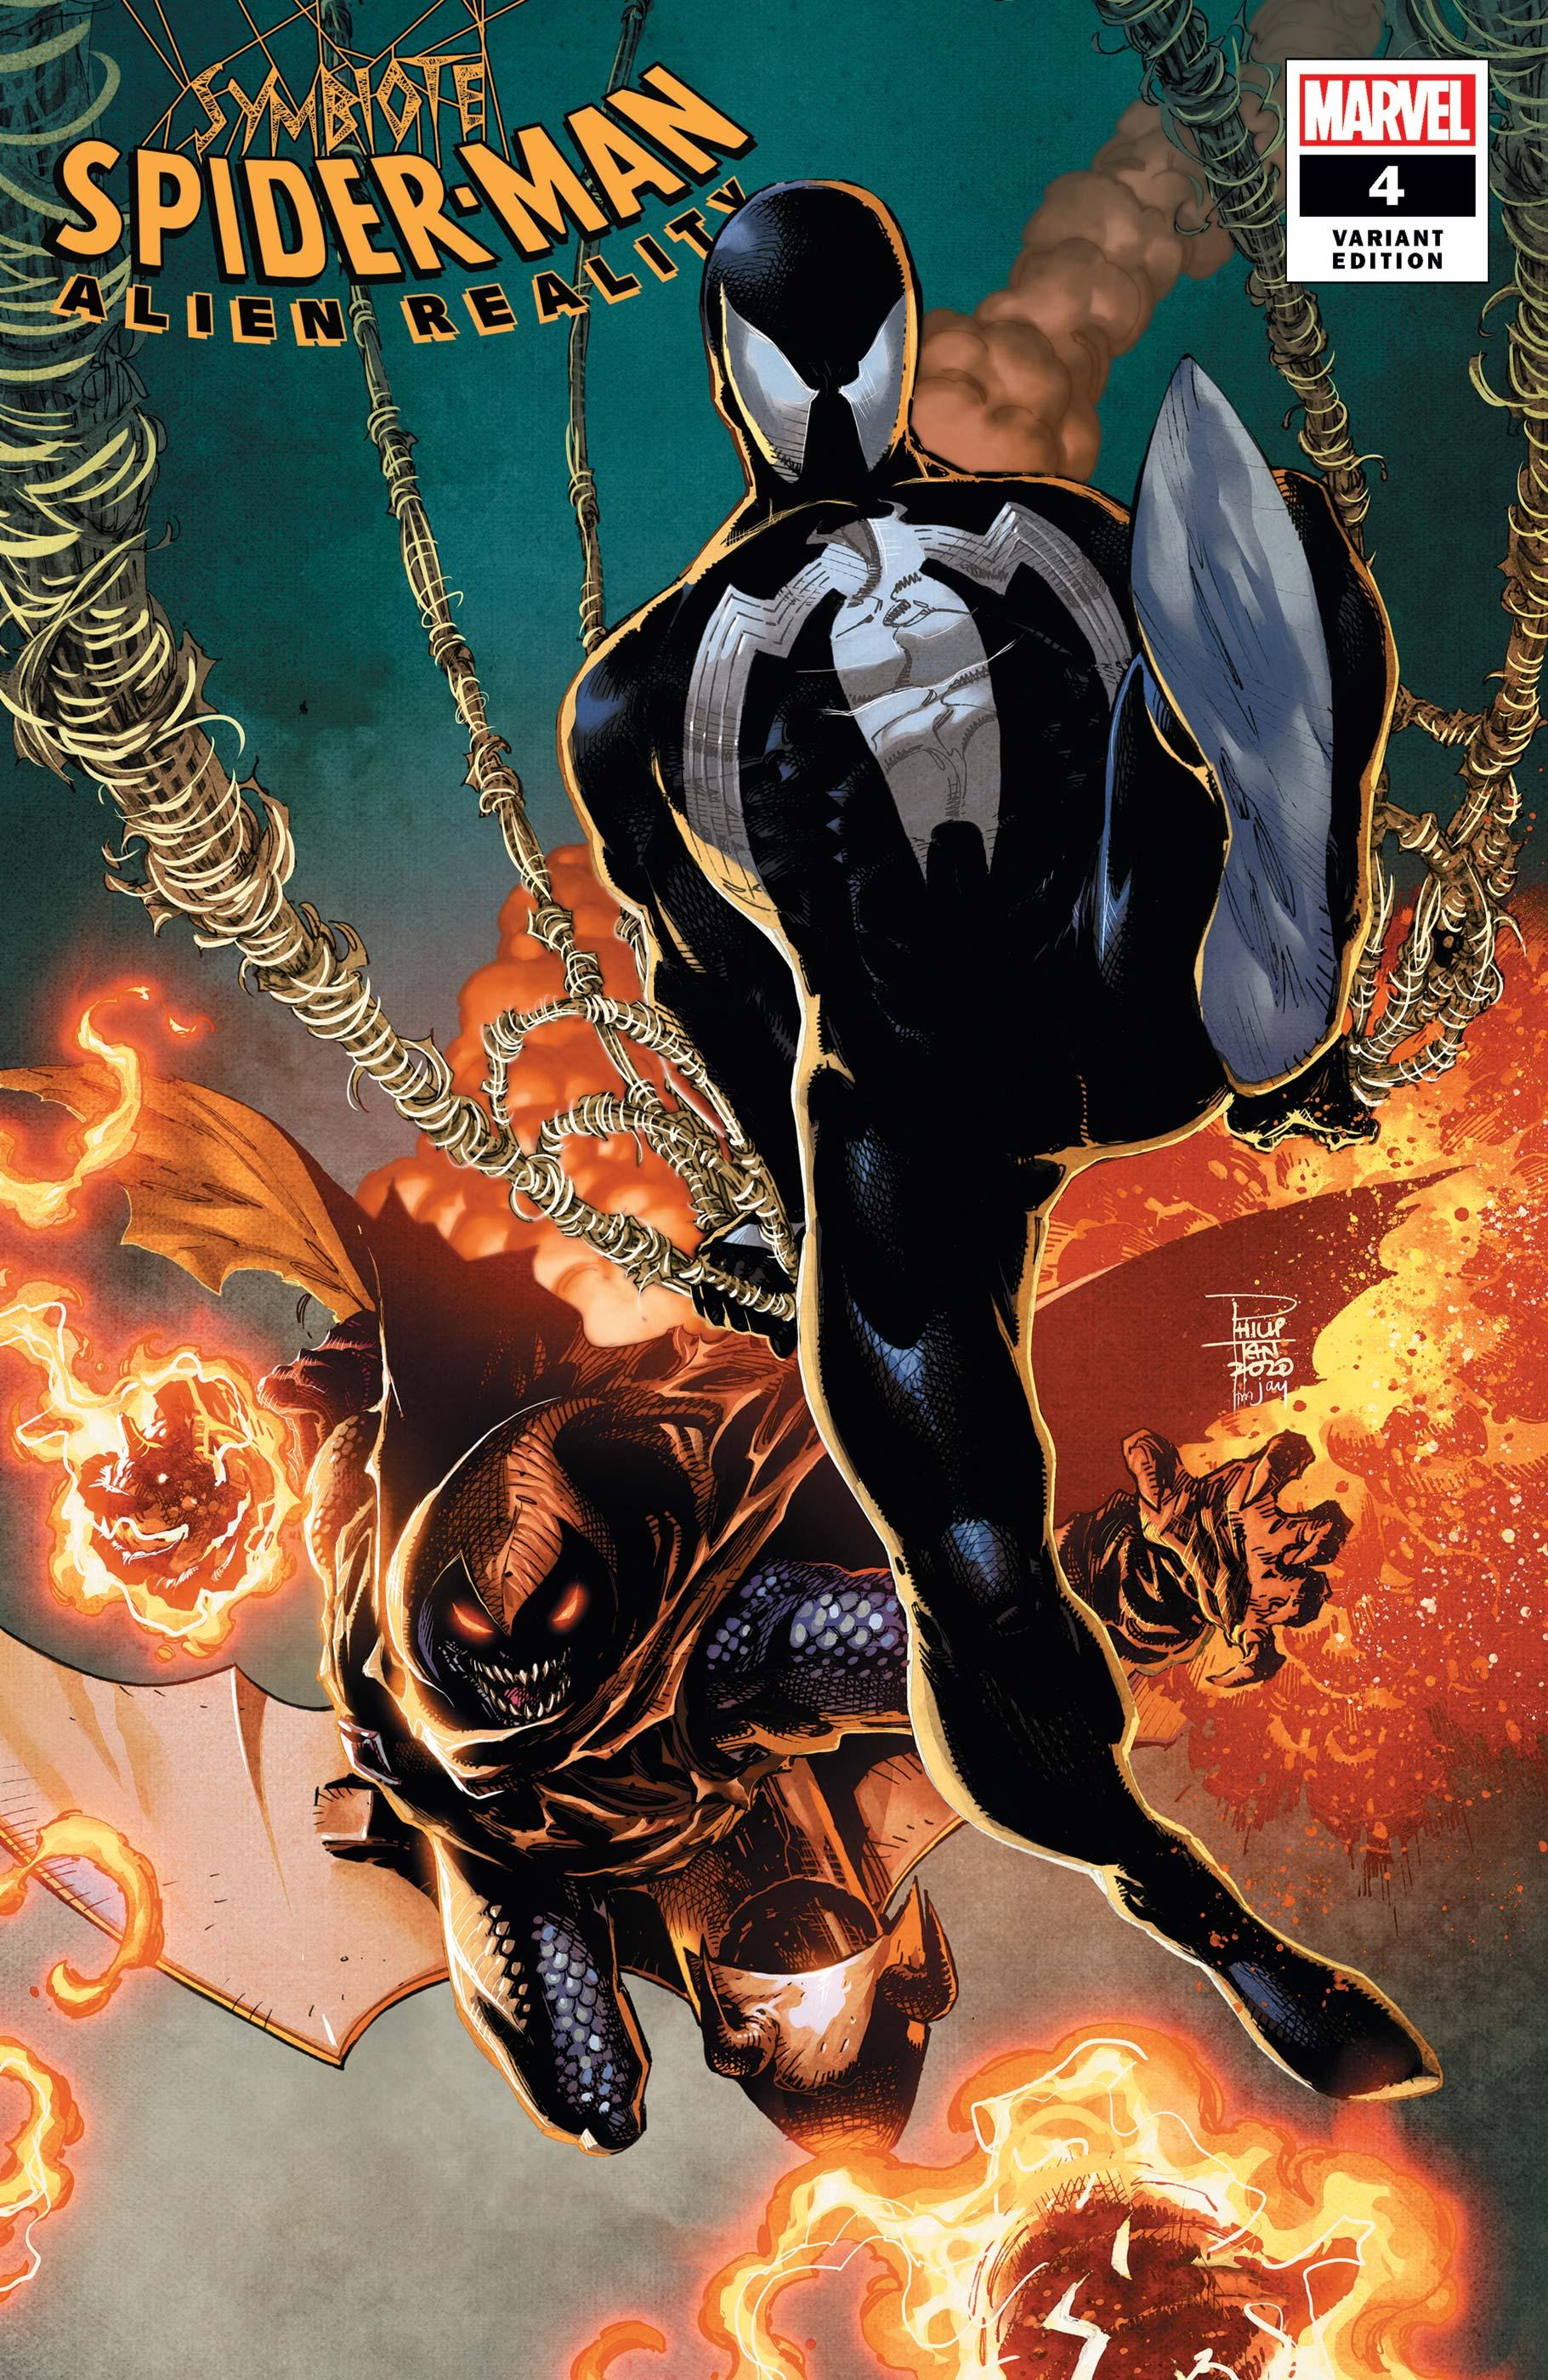 Symbiote Spider-Man: Alien Reality (2019) #4 (Variant)